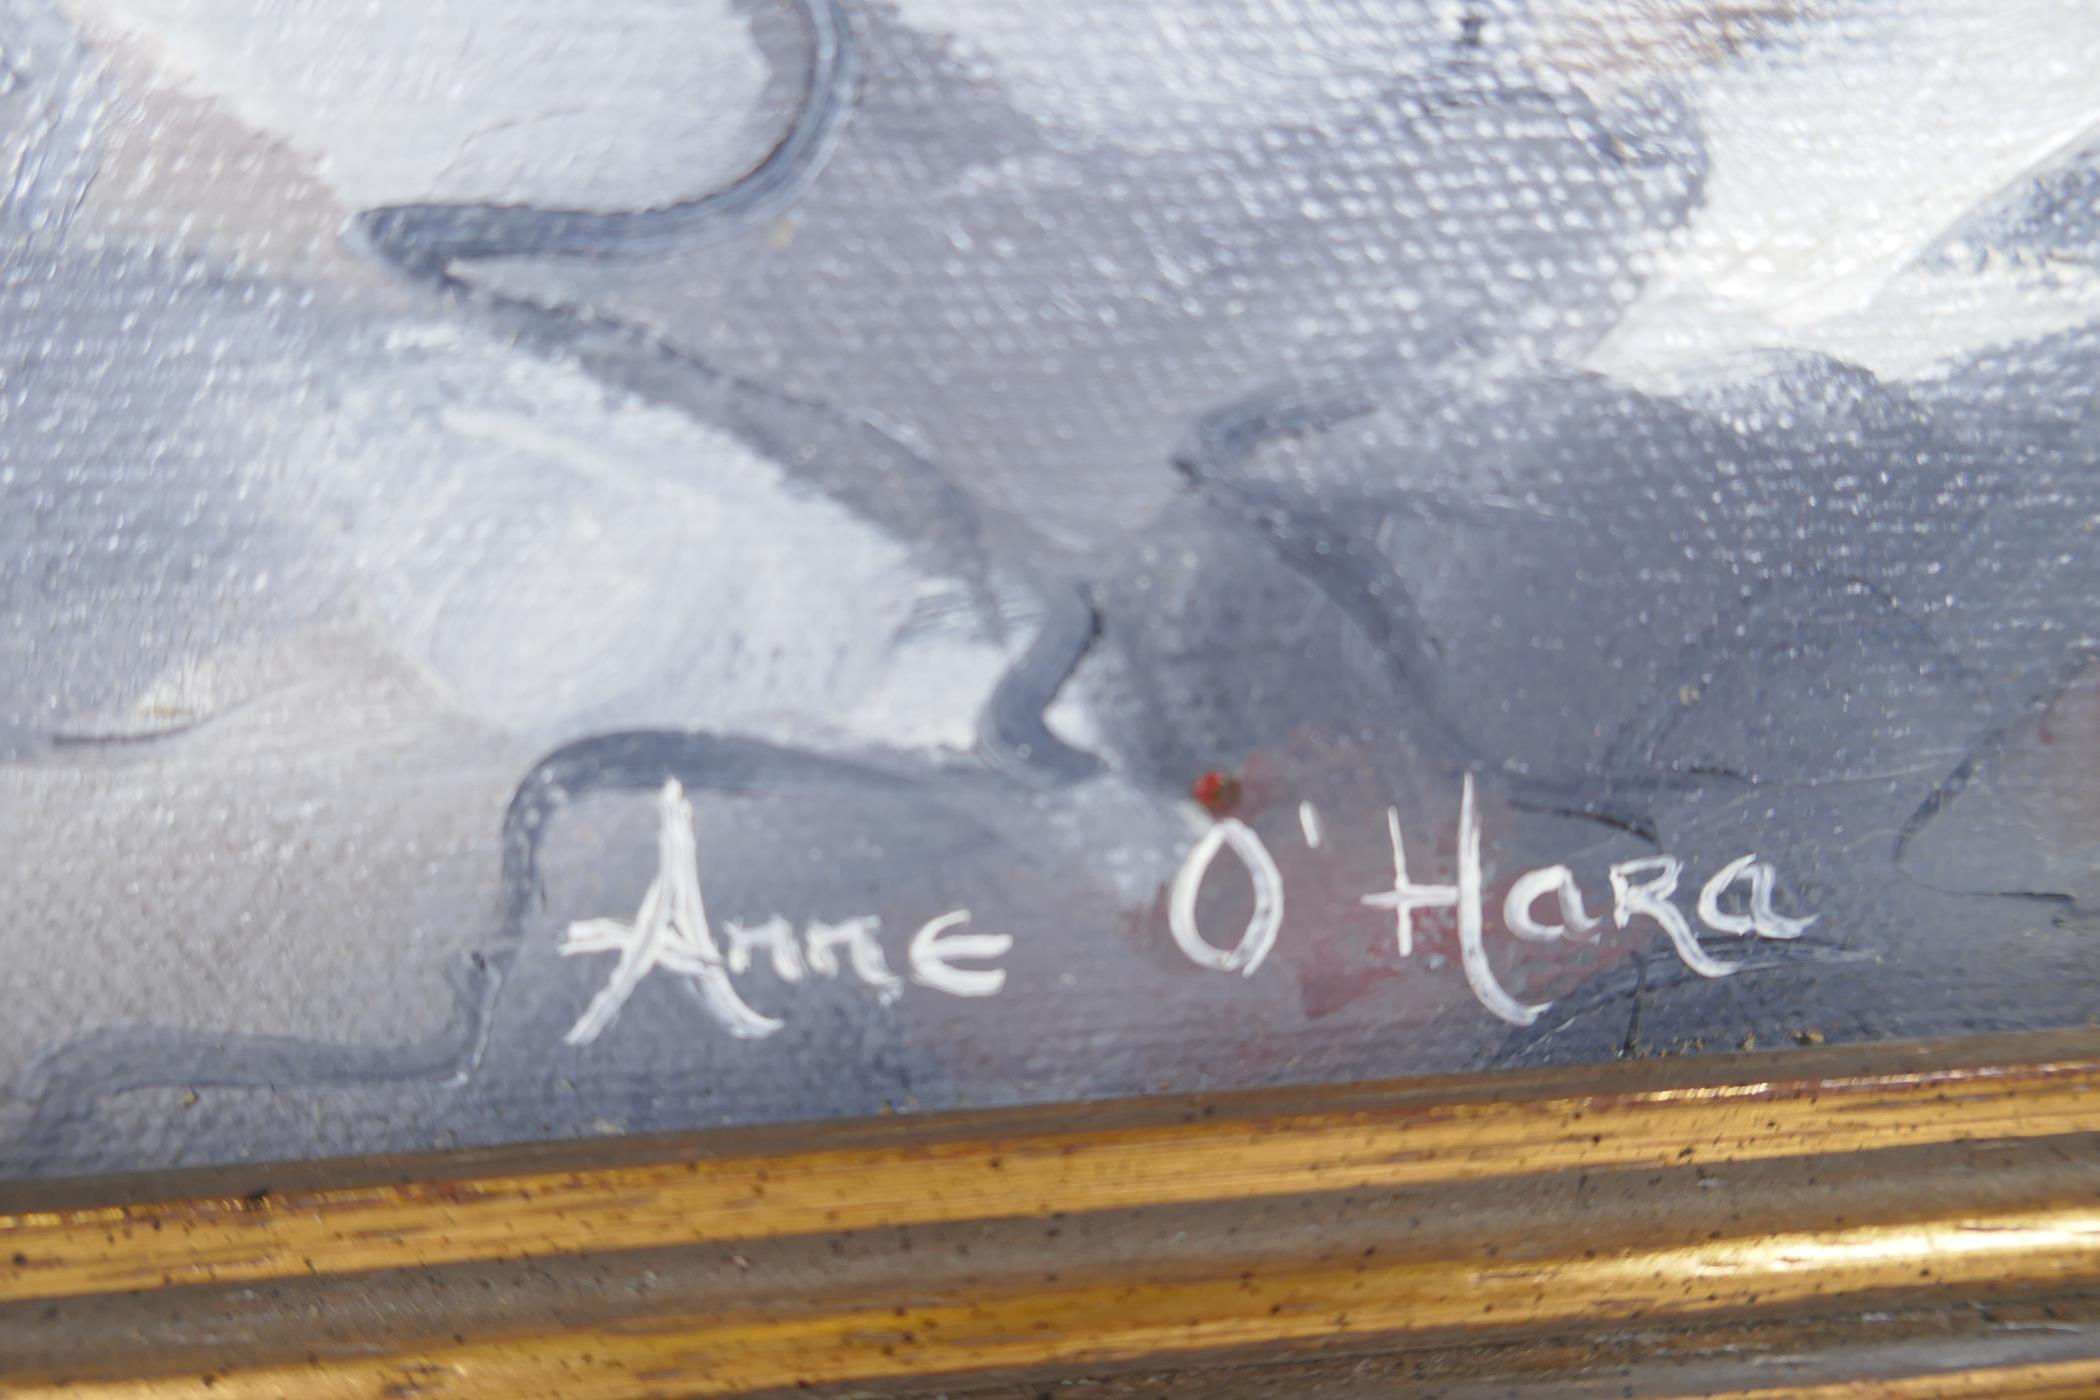 "Anne O' Hara, Irish coastal landscape, titled 'Ballybunion', signed, oil on canvas, 30"" x 18"" - Image 5 of 5"